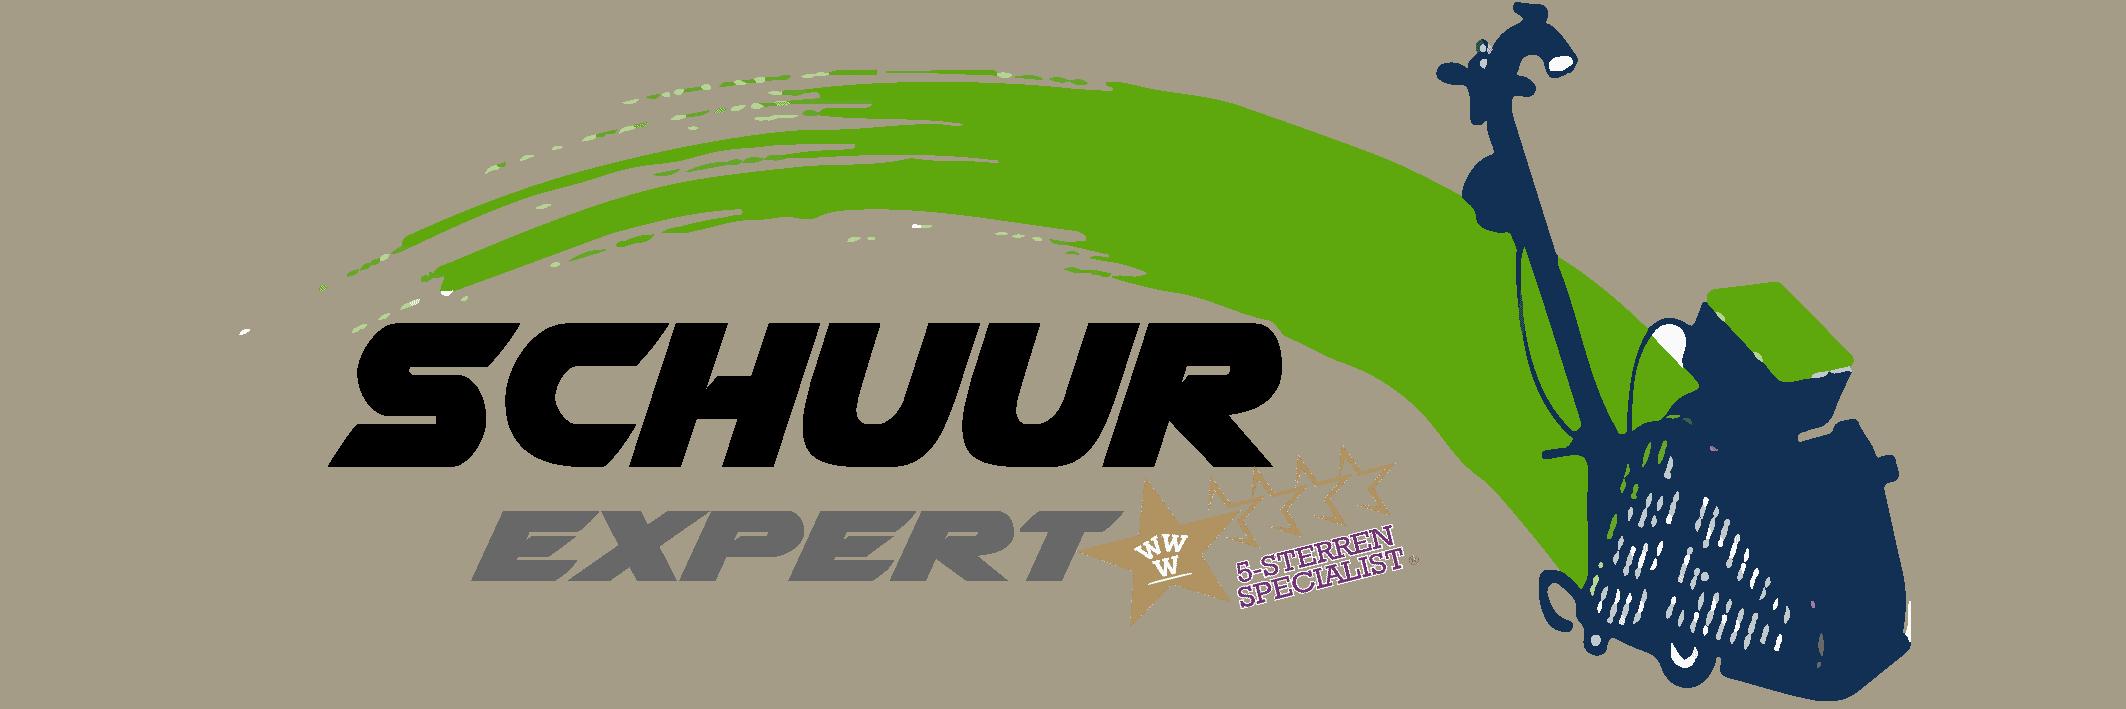 Schuur Expert